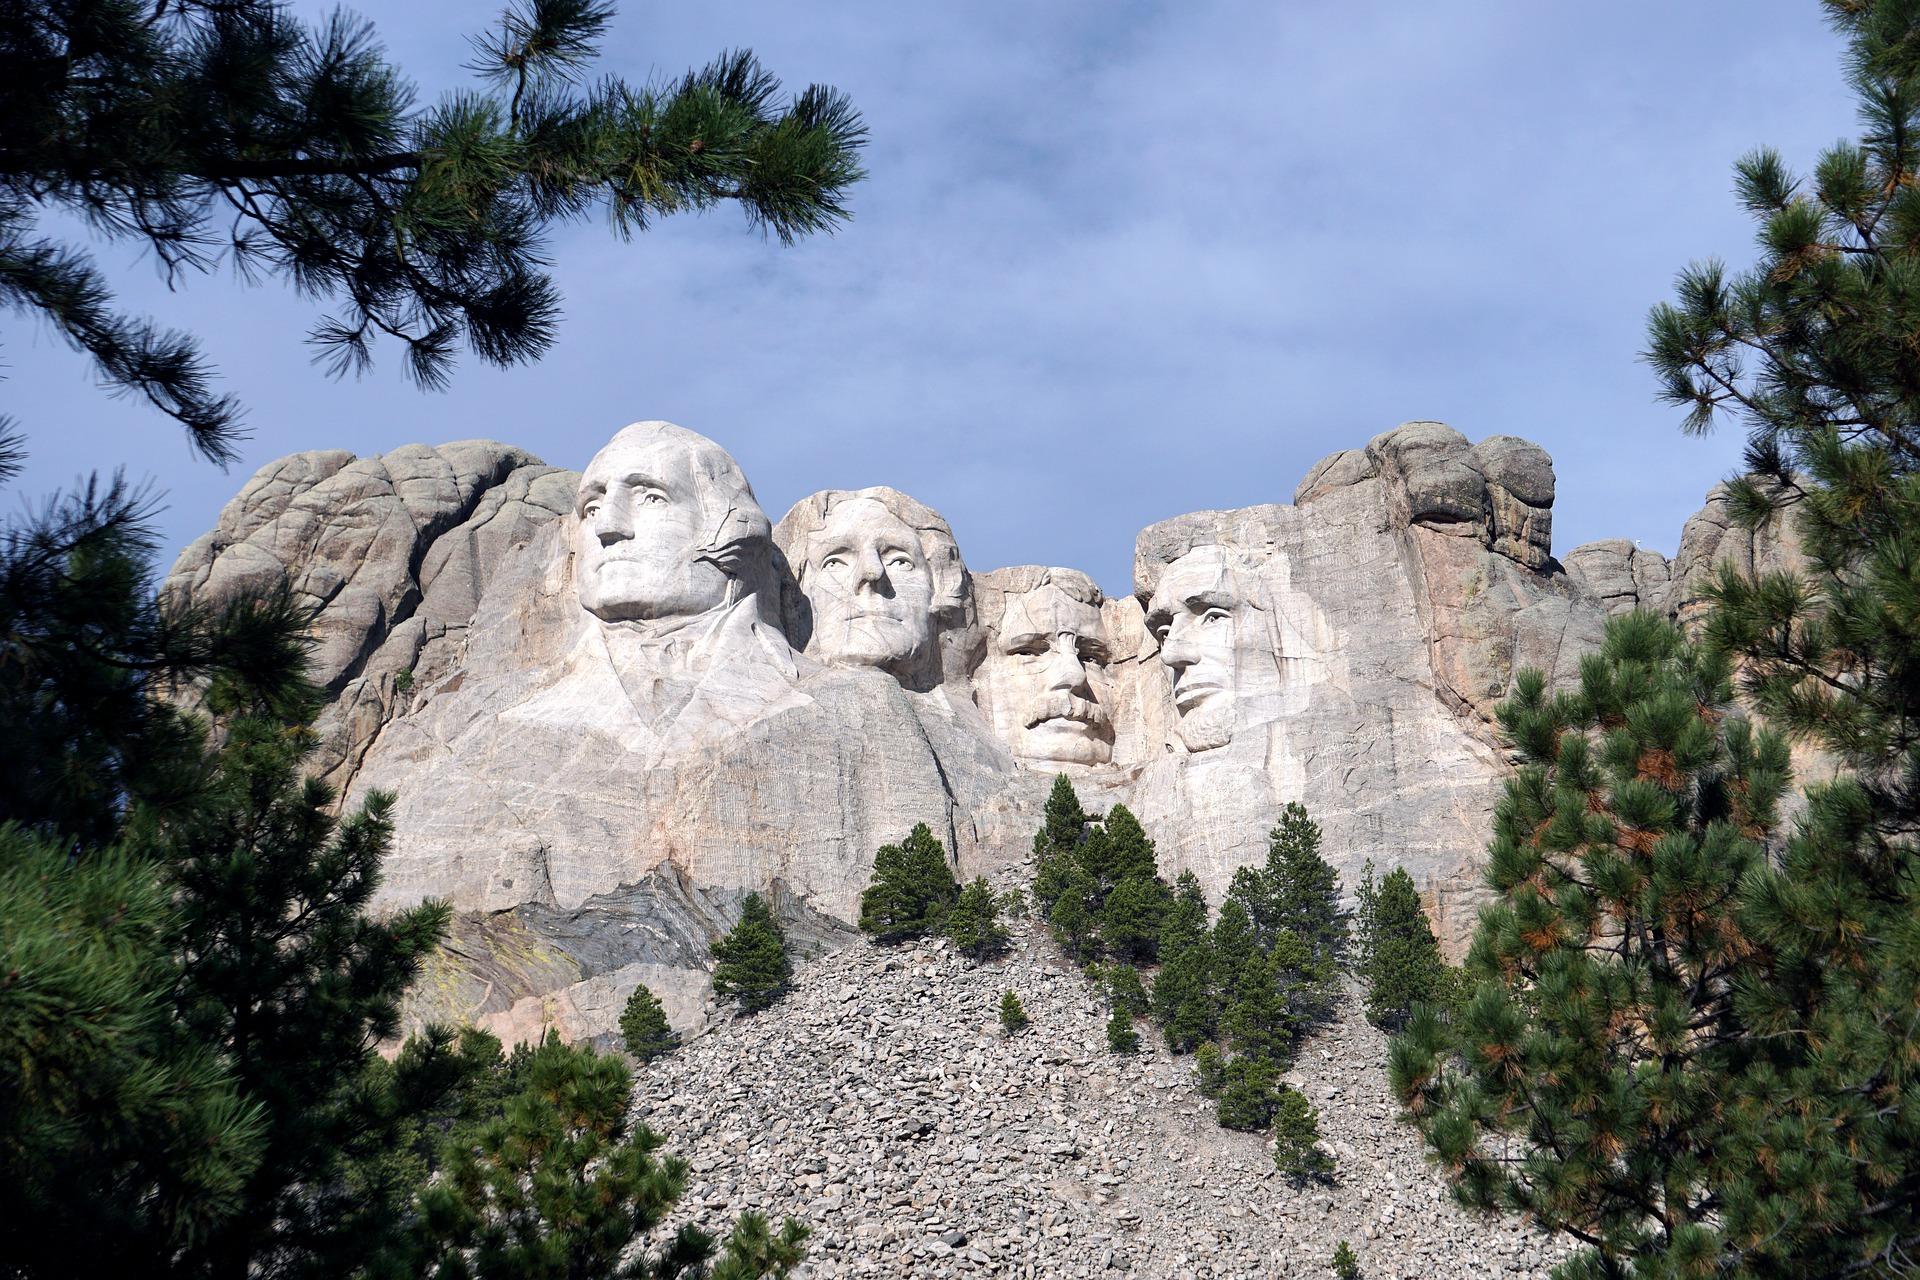 Presidential Trail - Mount Rushmore National Memorial Travel Guide